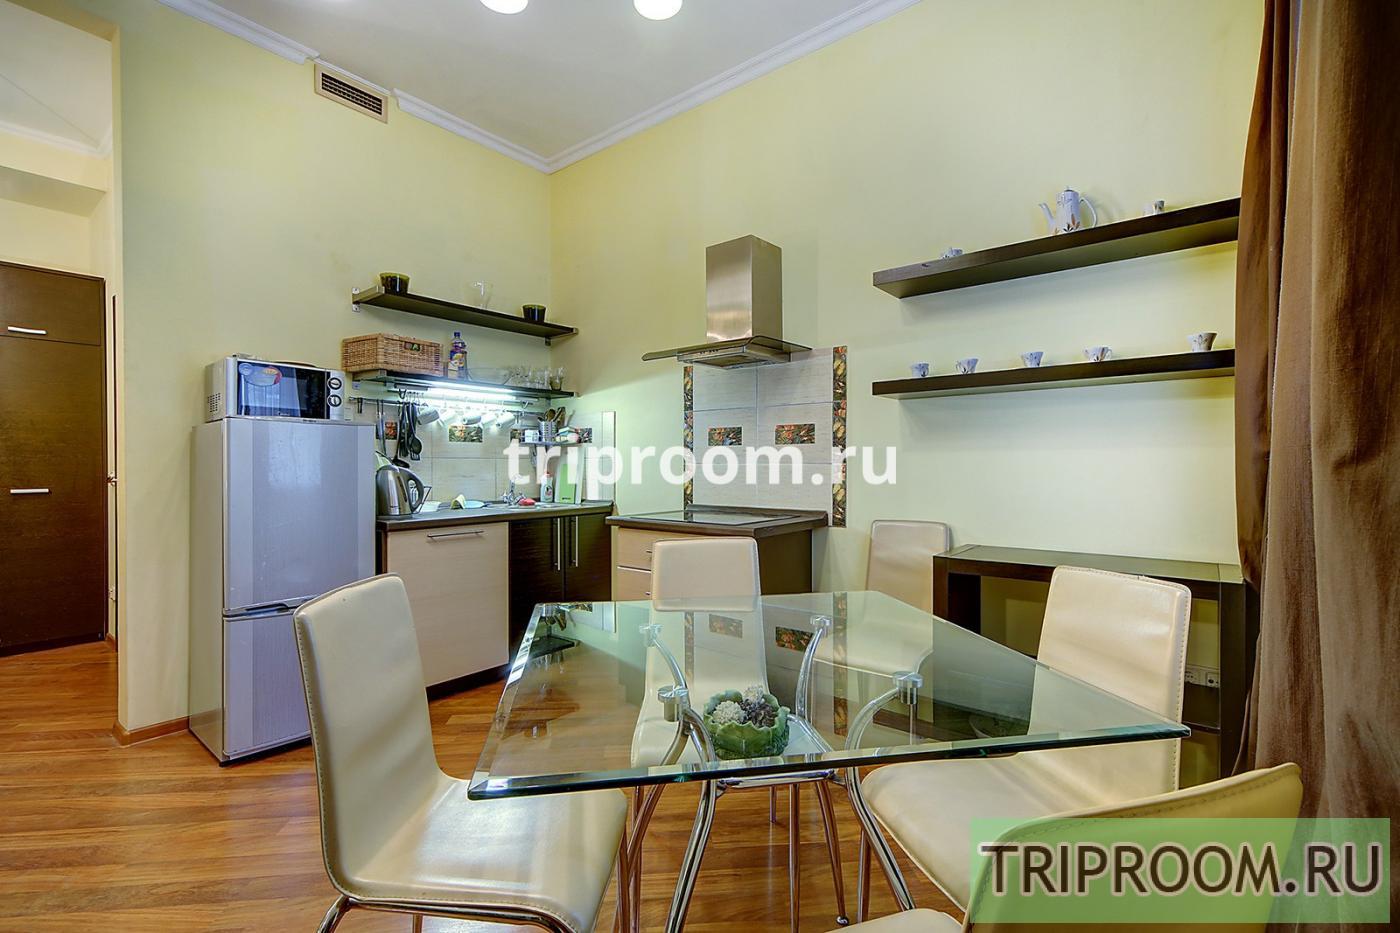 1-комнатная квартира посуточно (вариант № 15117), ул. Канала Грибоедова набережная, фото № 7